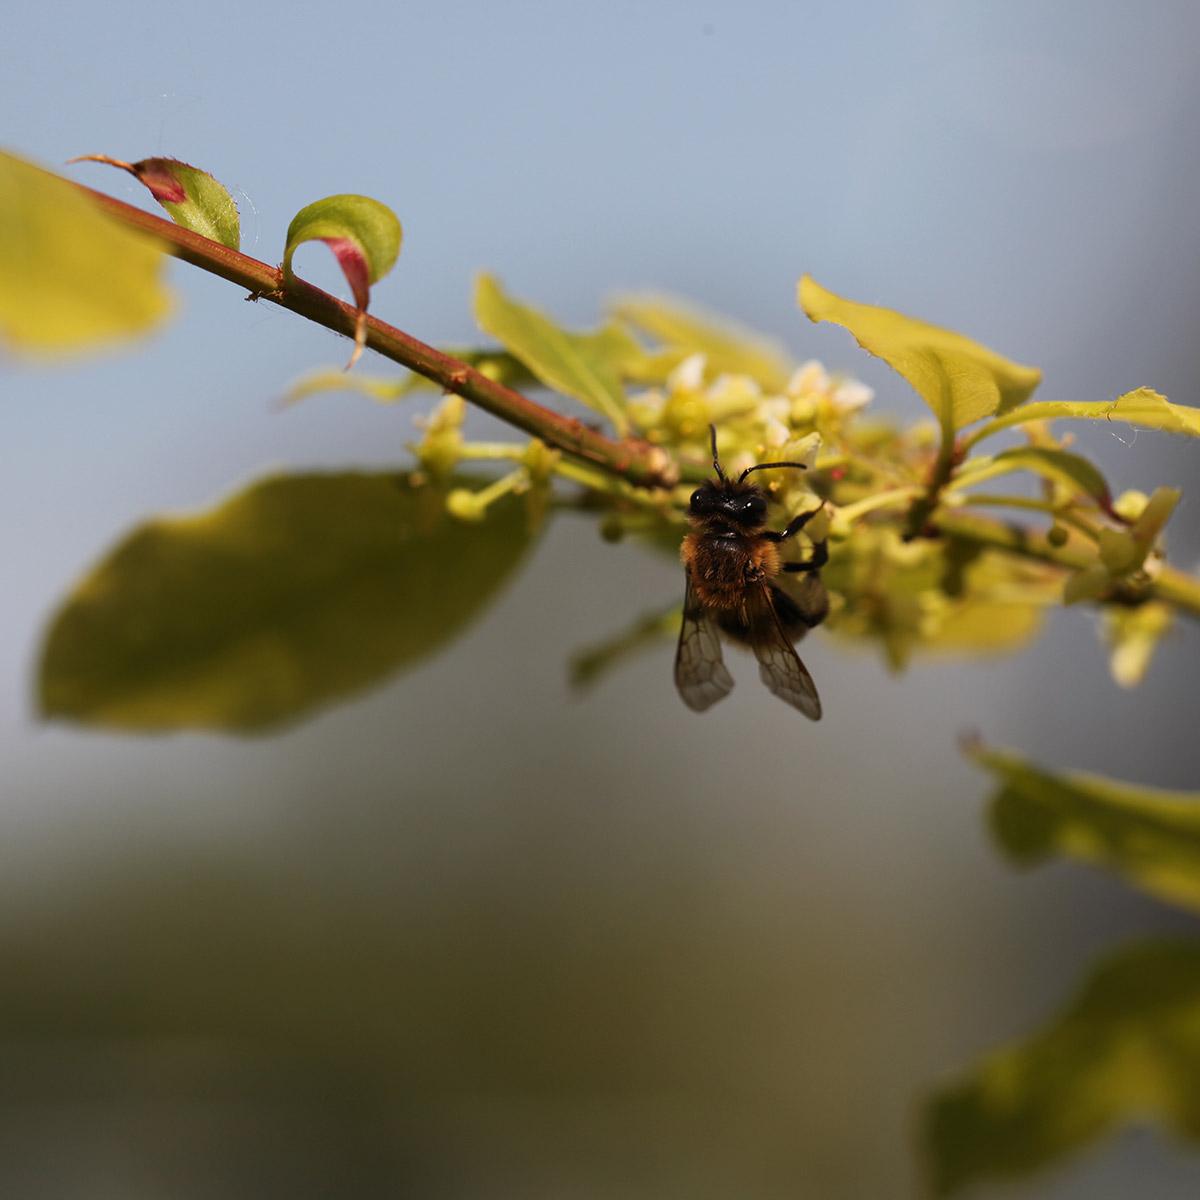 red-mason-bee-on-wildflowers.jpg